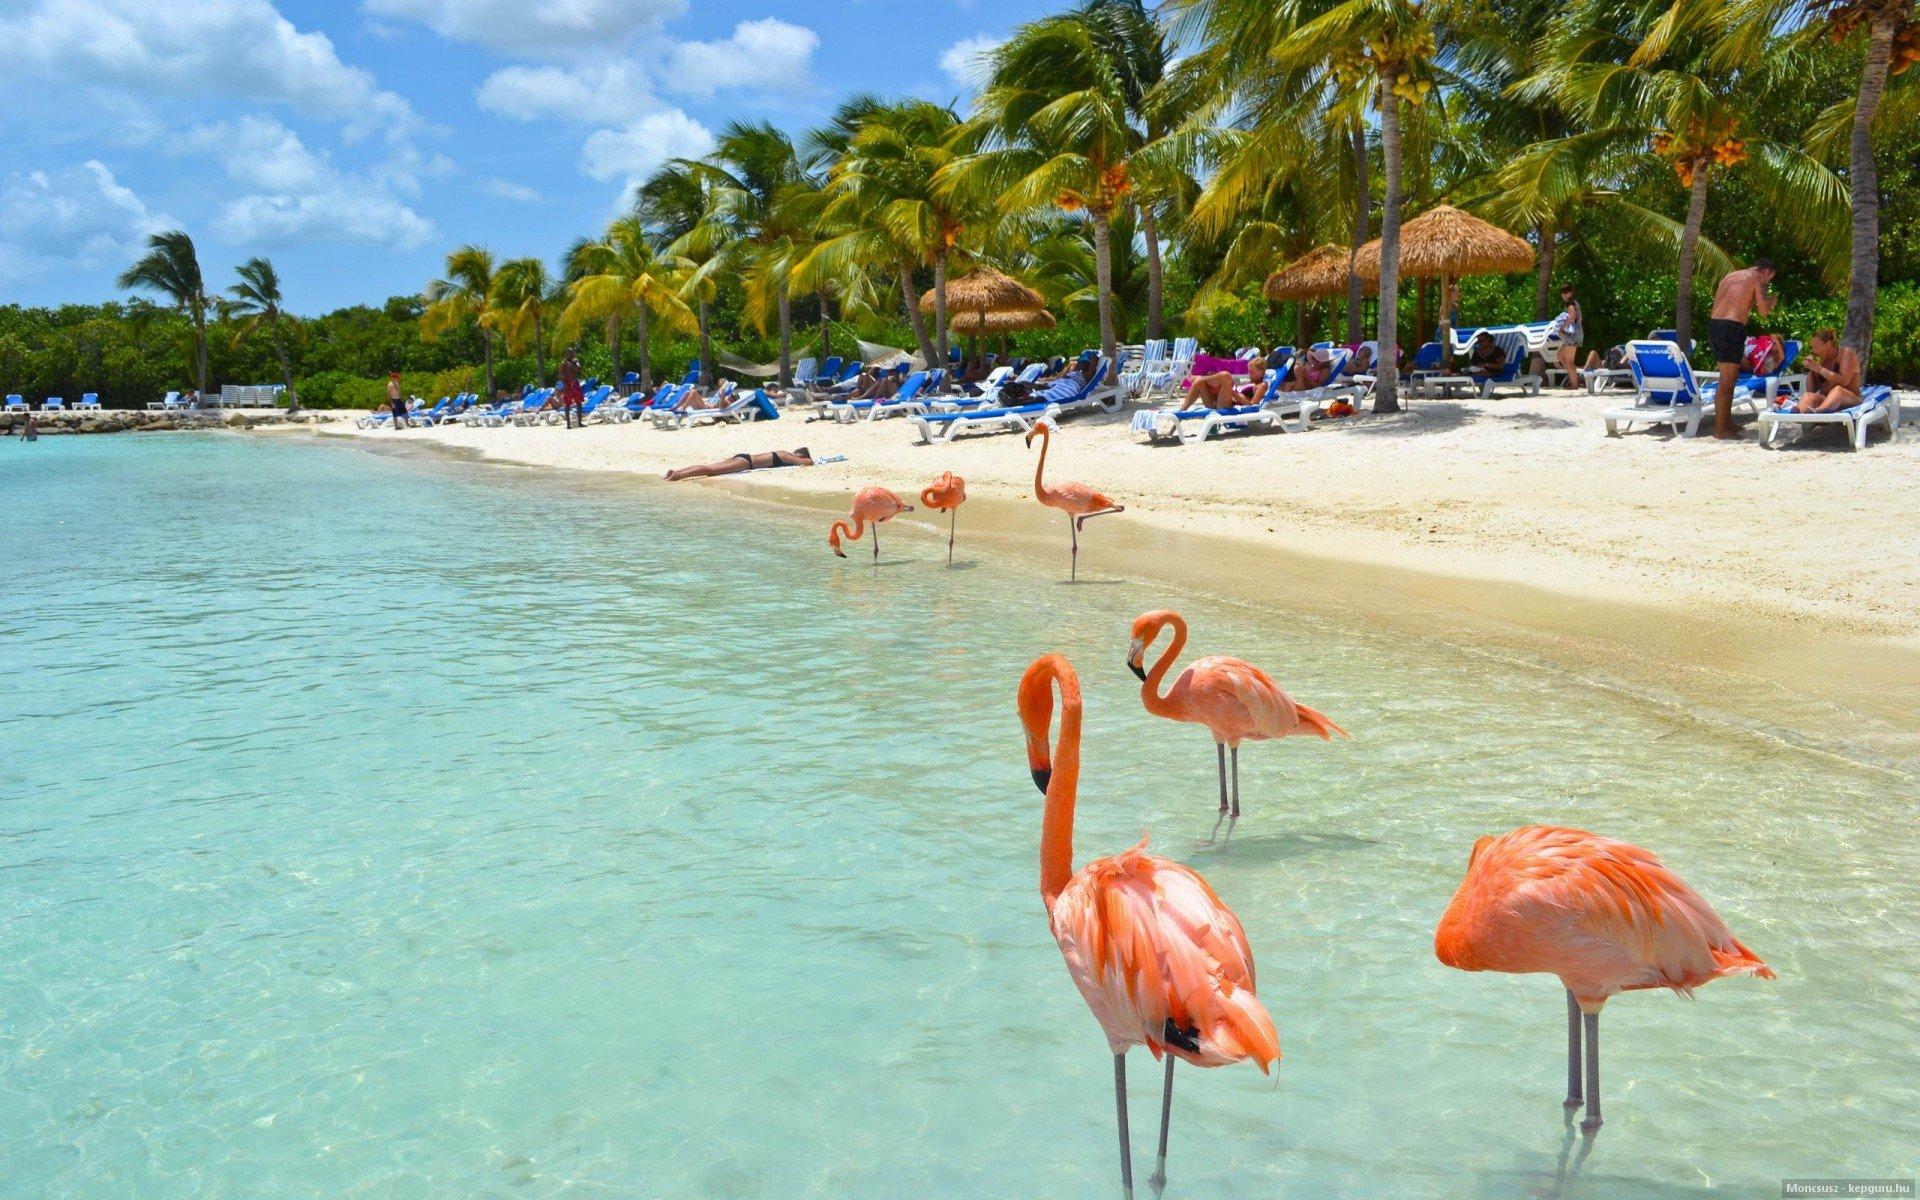 Wallpaper 1920x1200 Px Pantai Burung Burung Flamingo Pulau